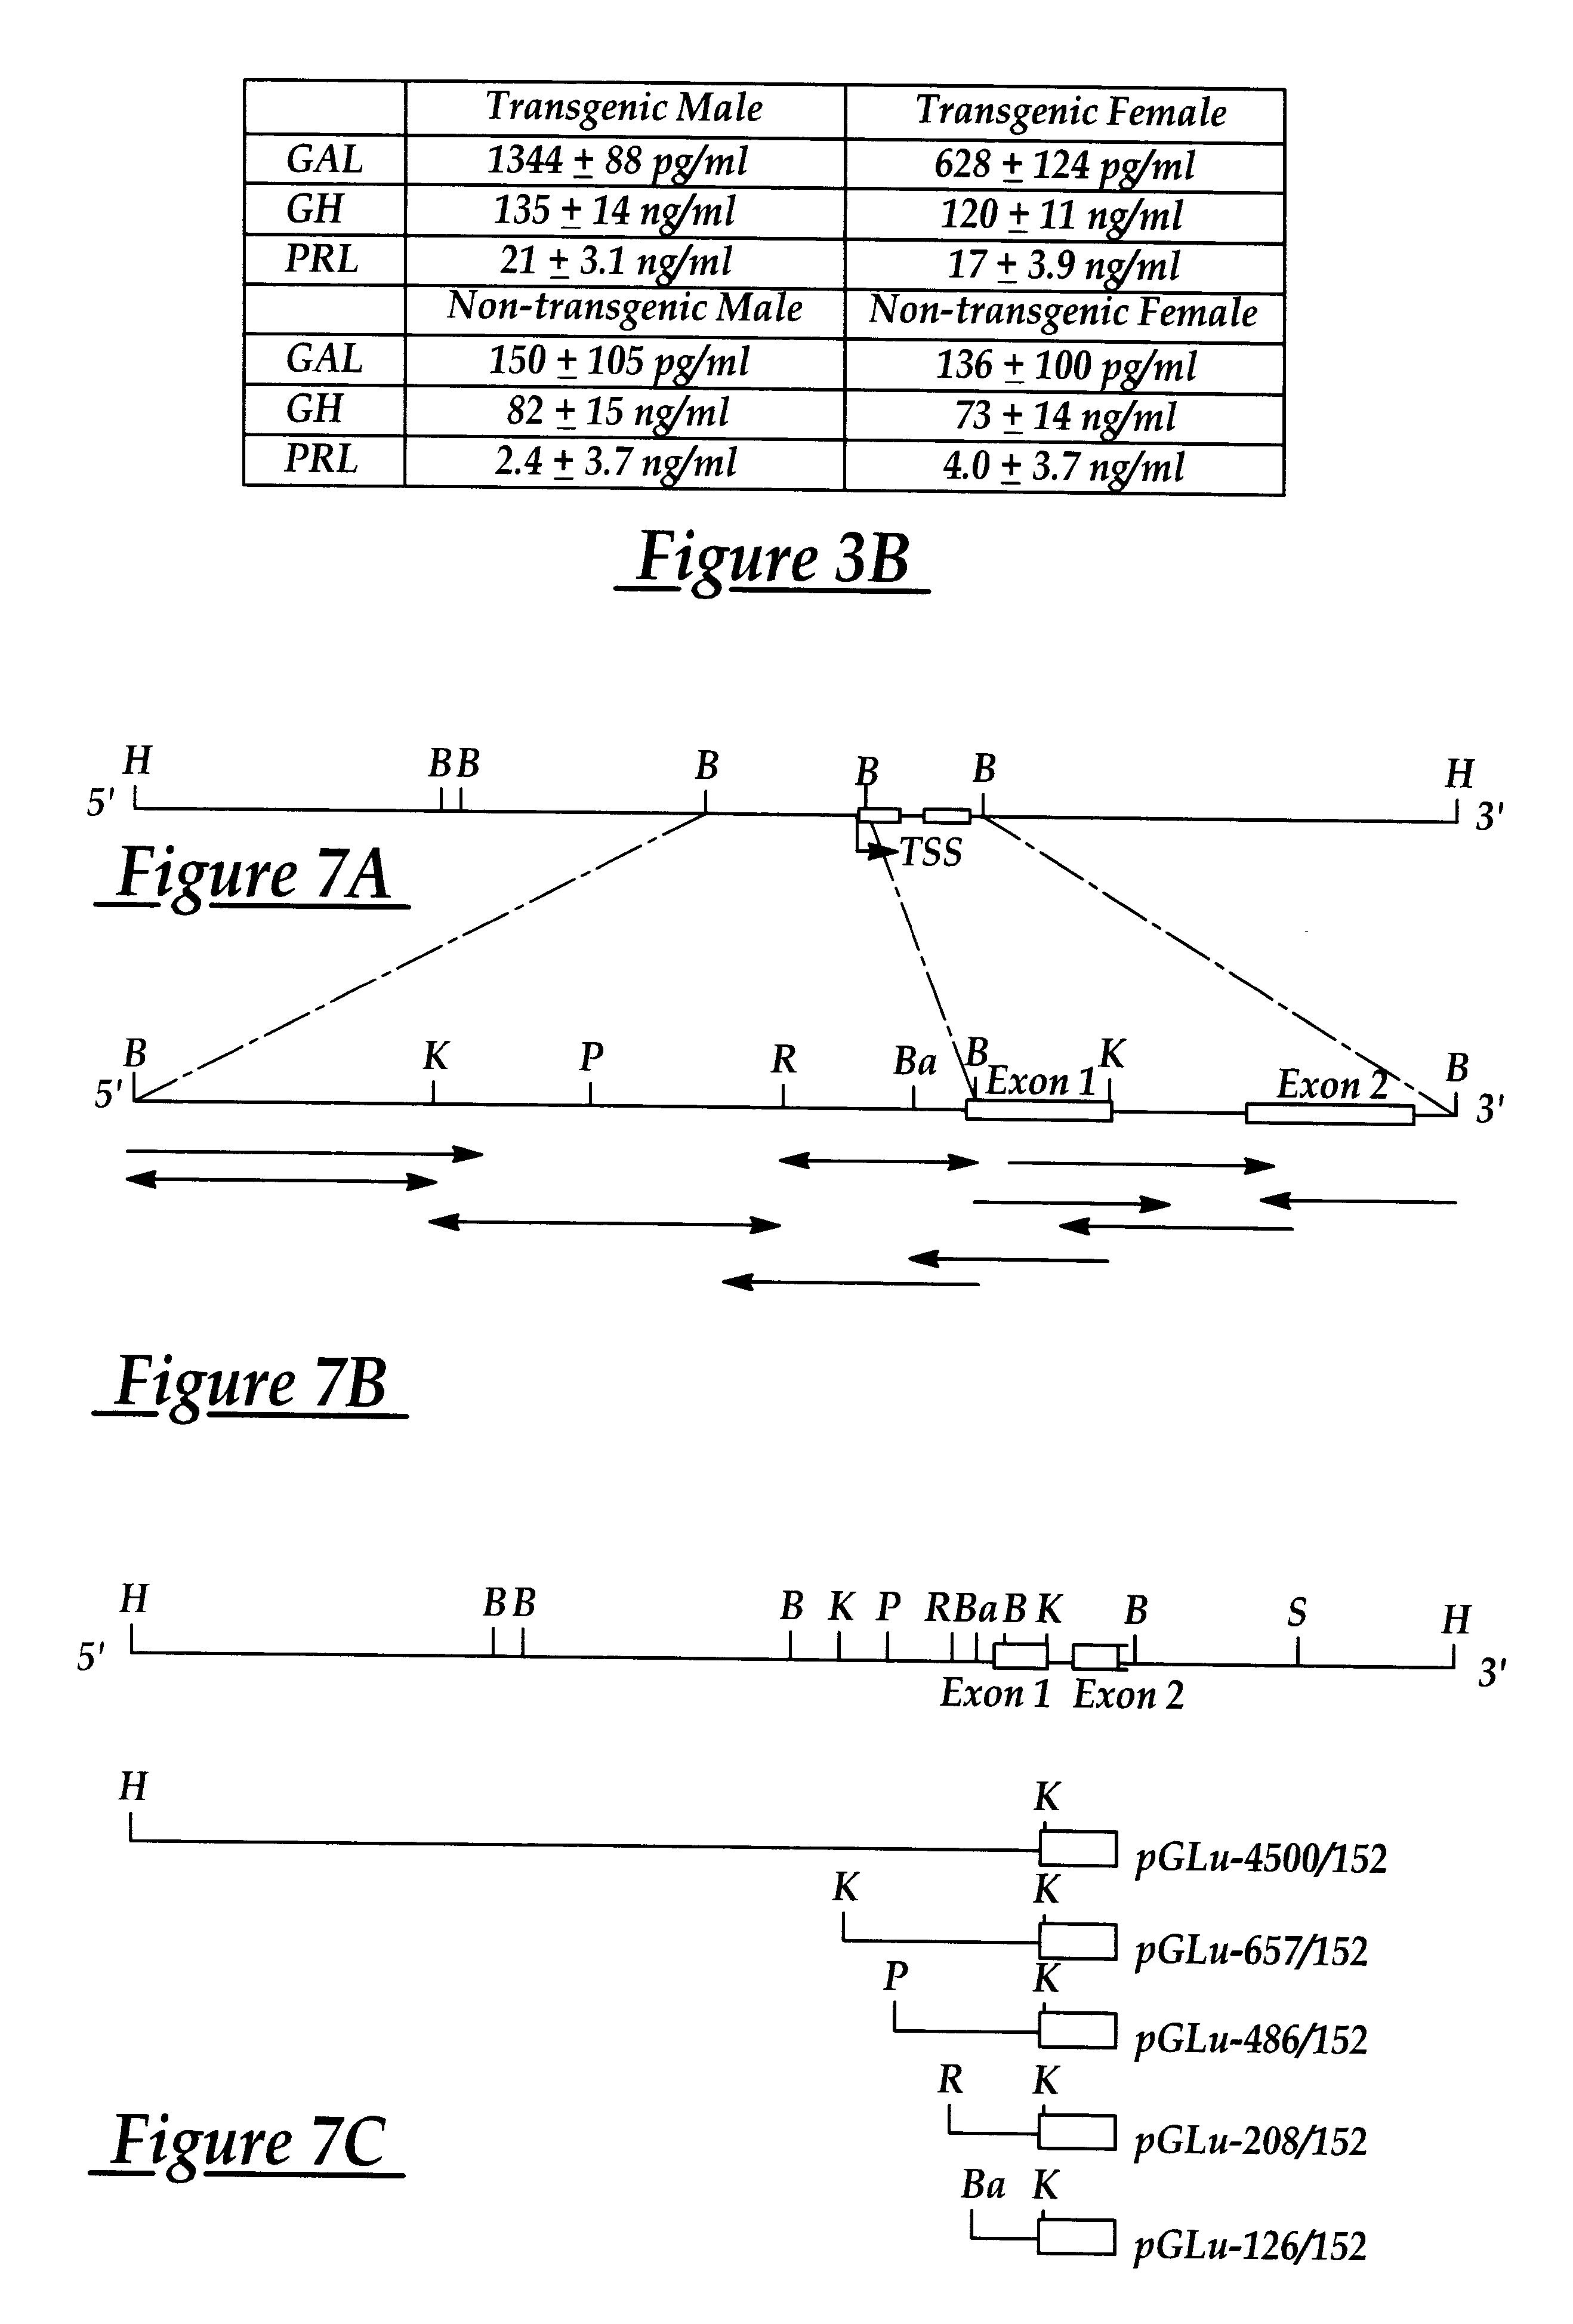 US6414220B1 - Galanin transgenic mice - Google Patents